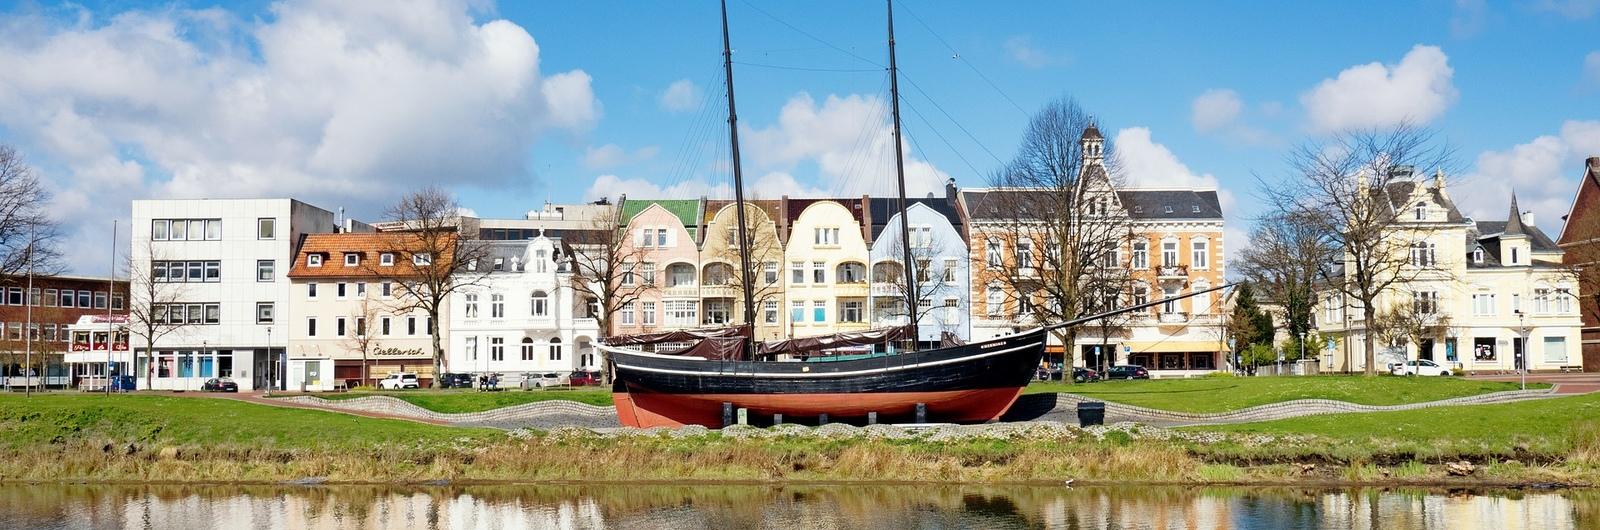 cuxhaven city header